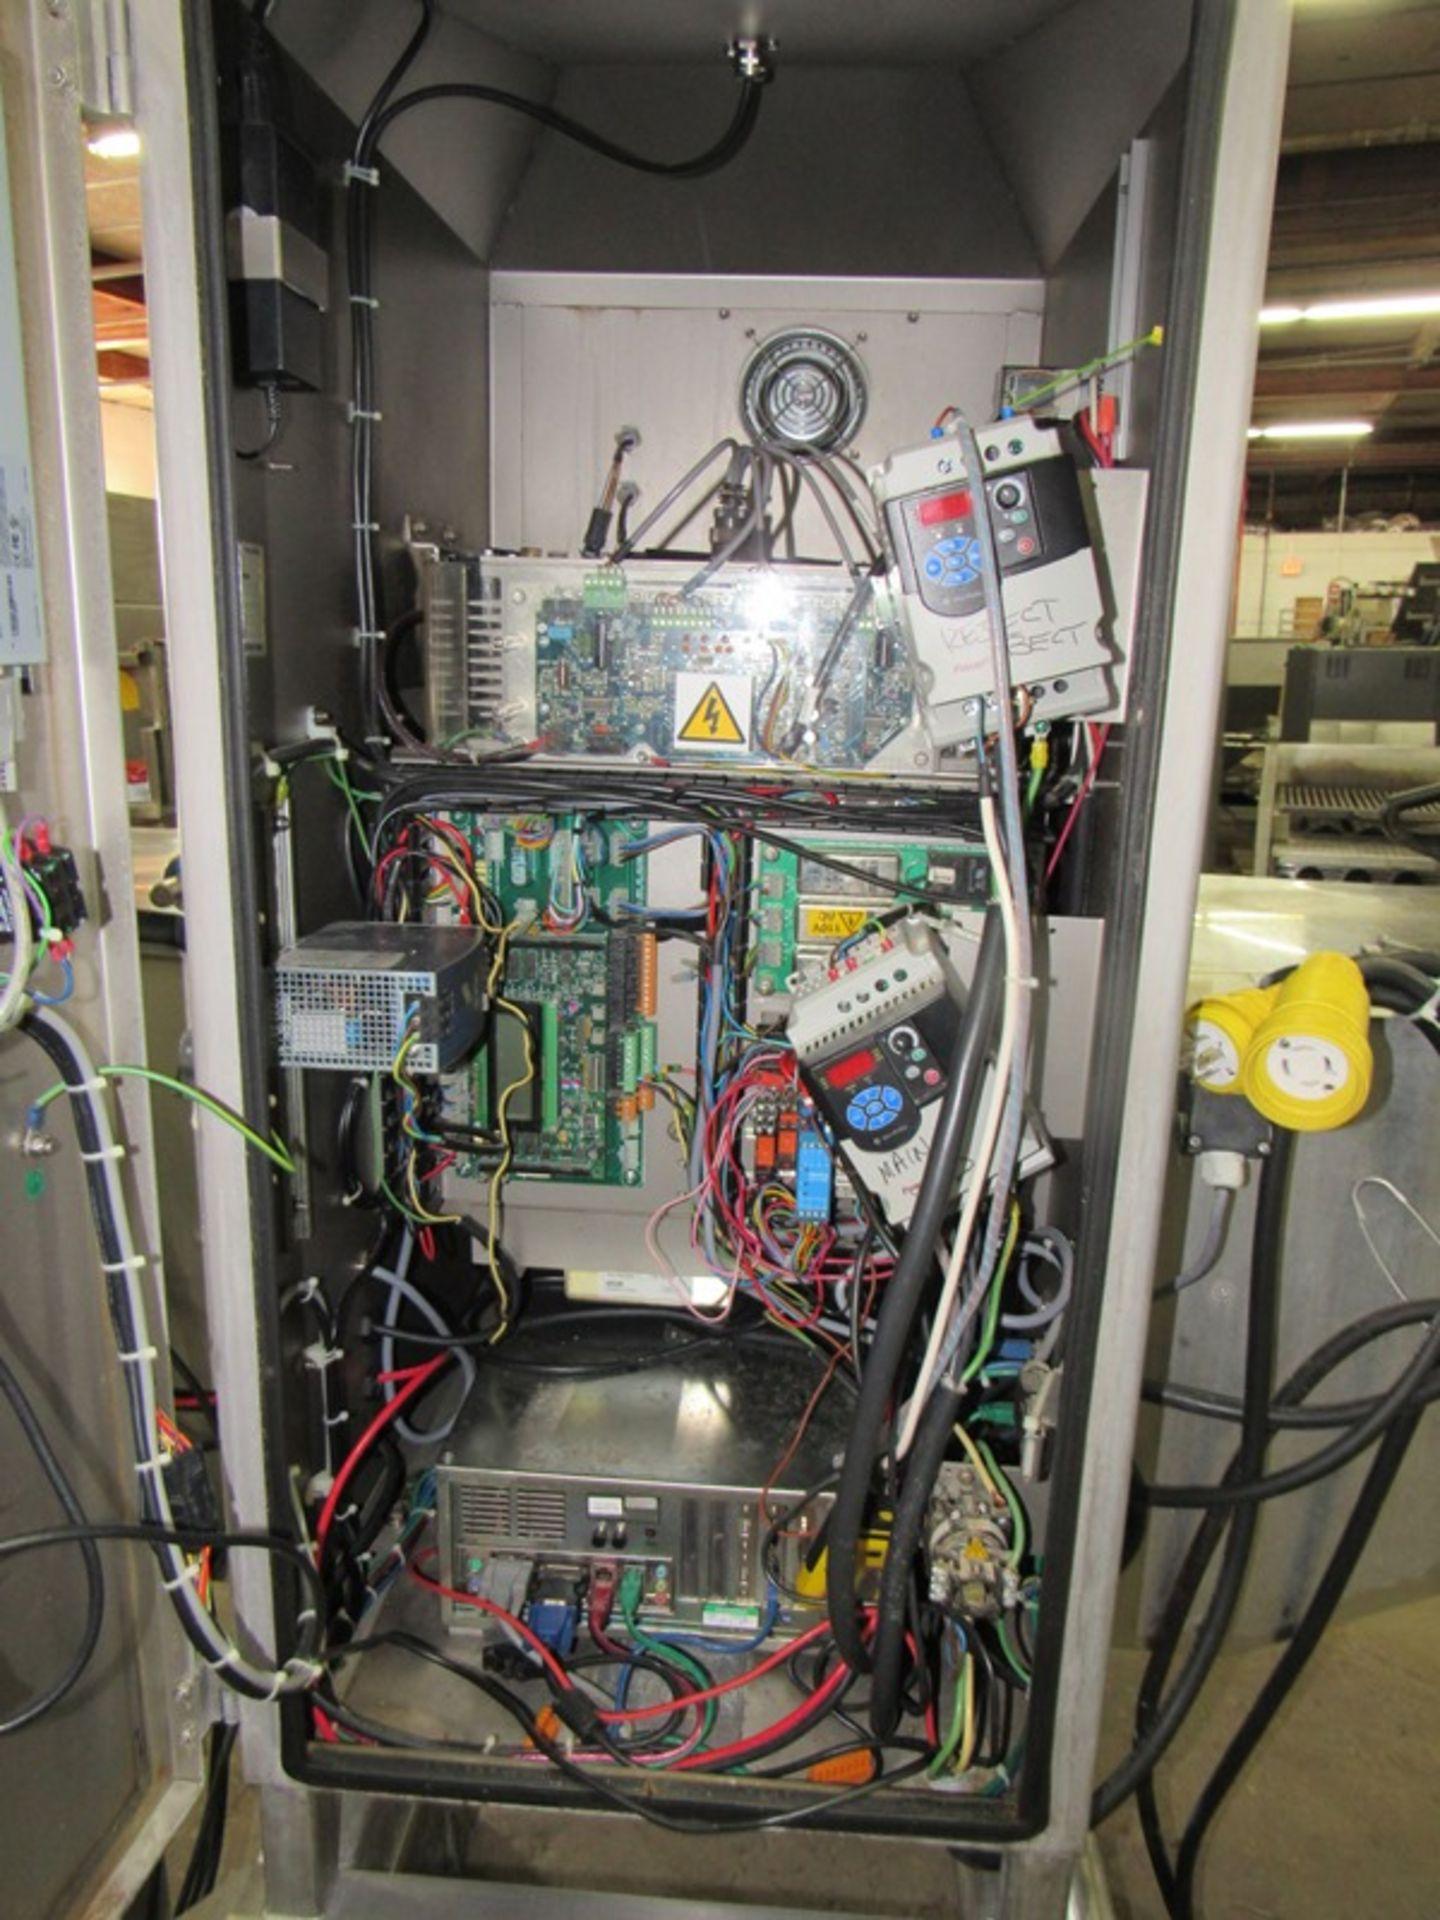 "Lot 30 - Mettler-Toledo Mdl. Powercheck +300 Safeline X-ray Inspection System, 13"" W X 80"" L X 3 1/2"" T"